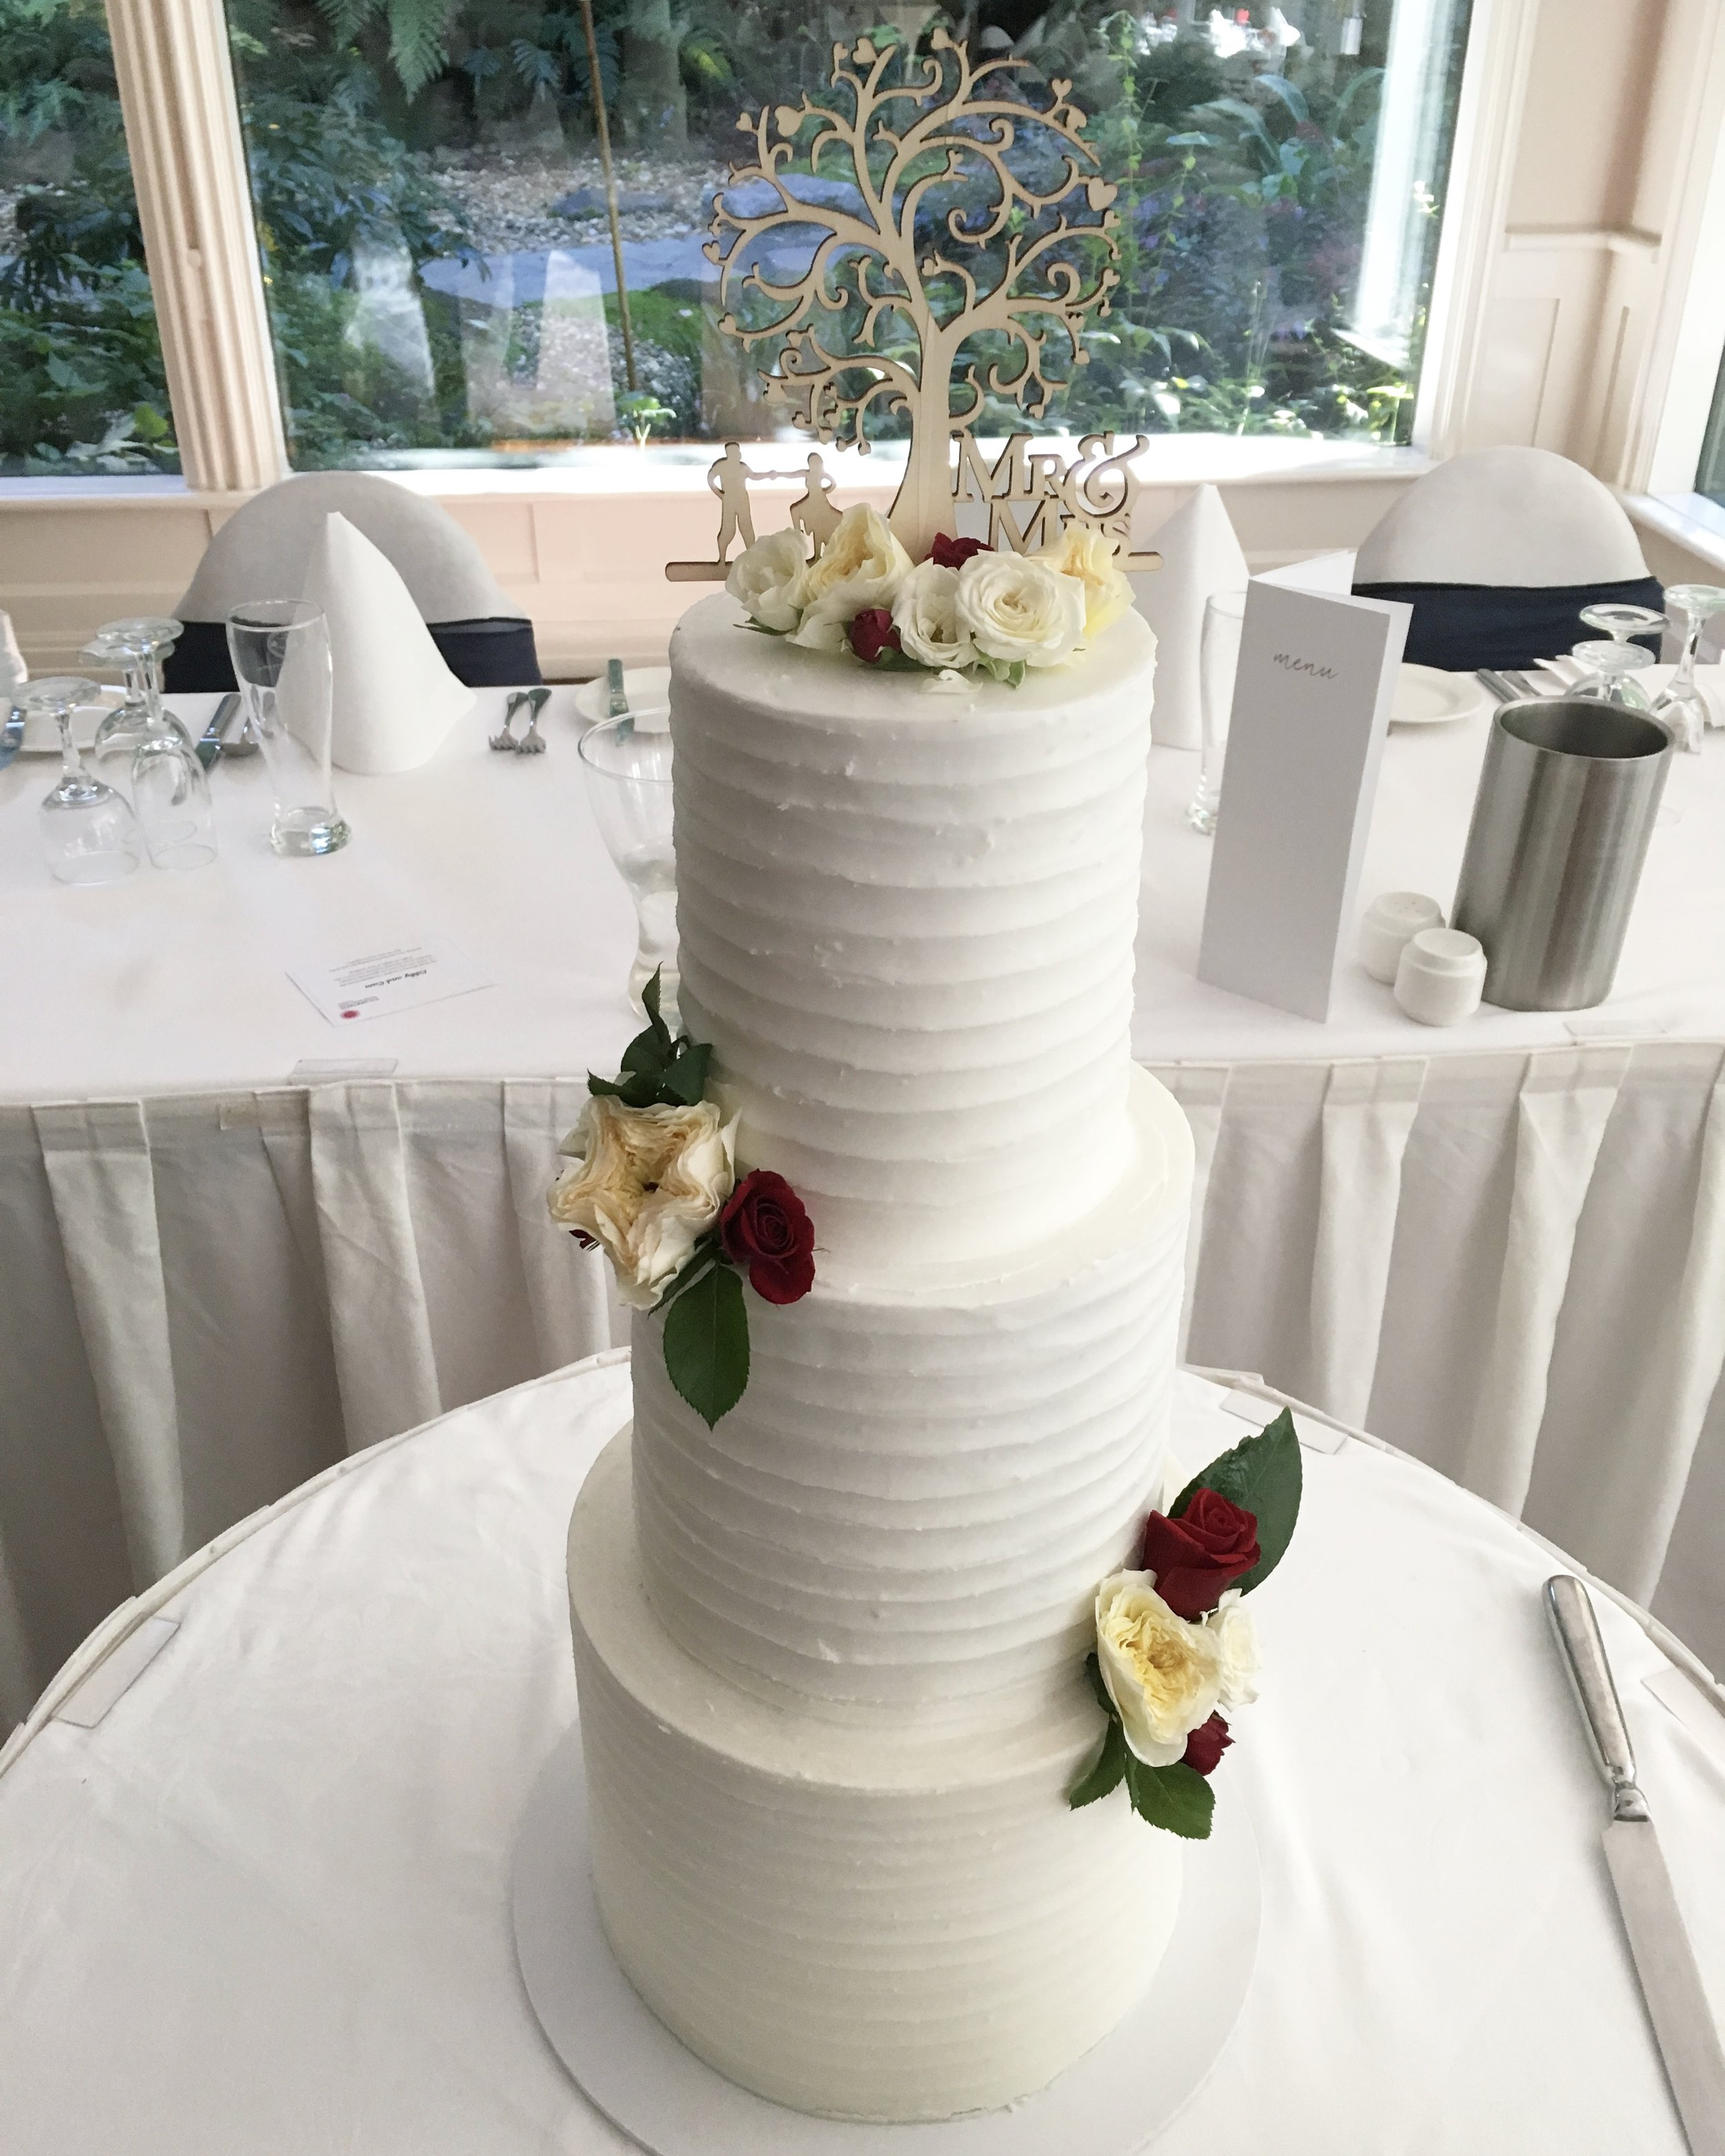 Horizontal Lined Buttercream Cake